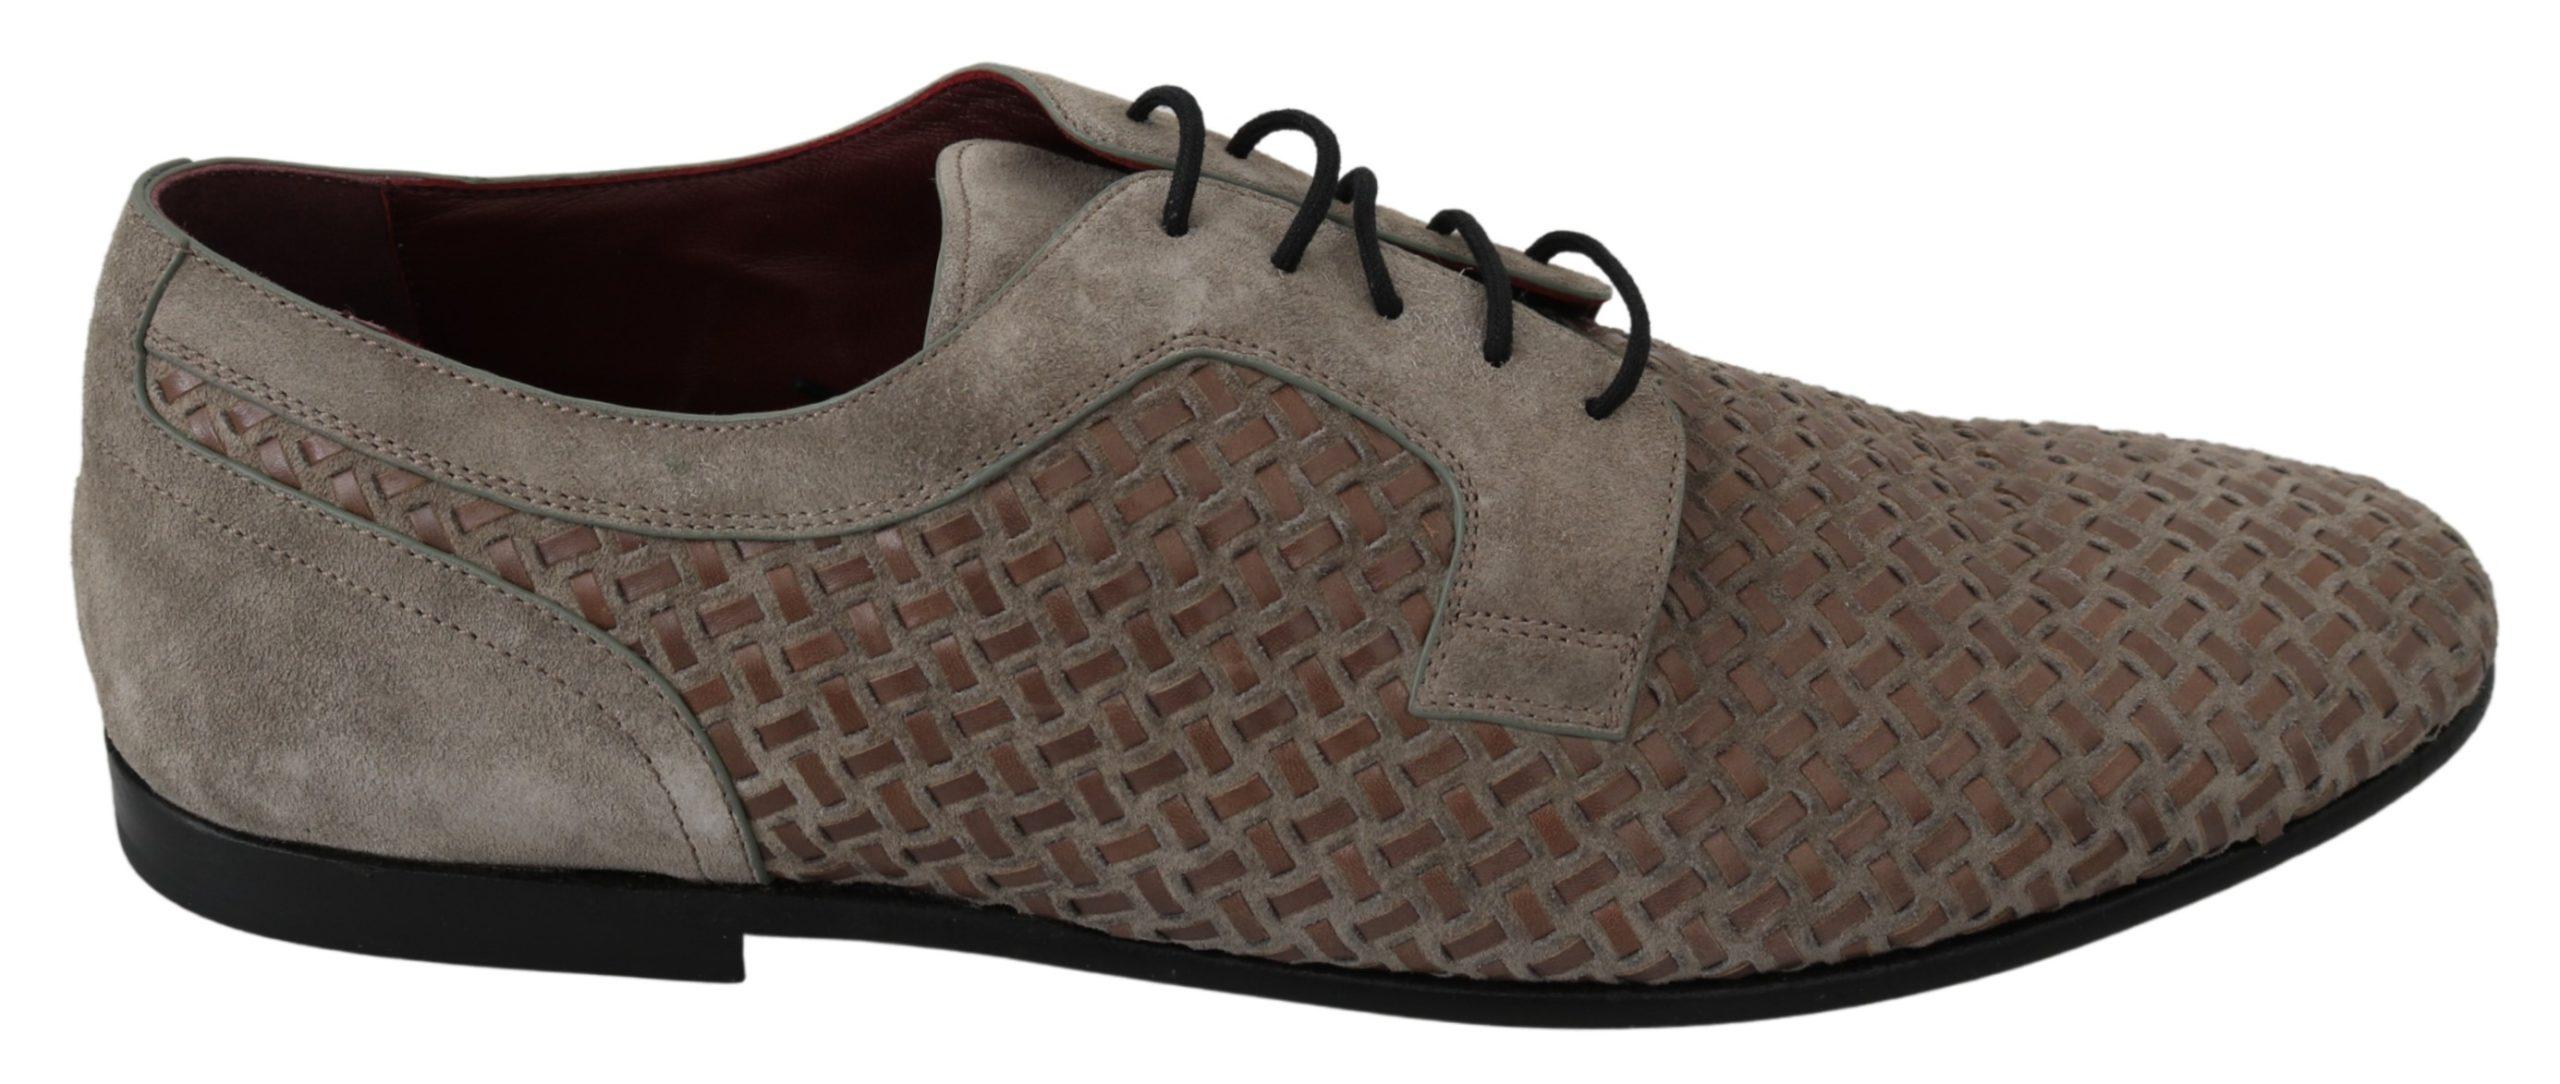 Dolce & Gabbana Men's Leather Suede Derby Shoe Brown MV3052 - EU44/US11